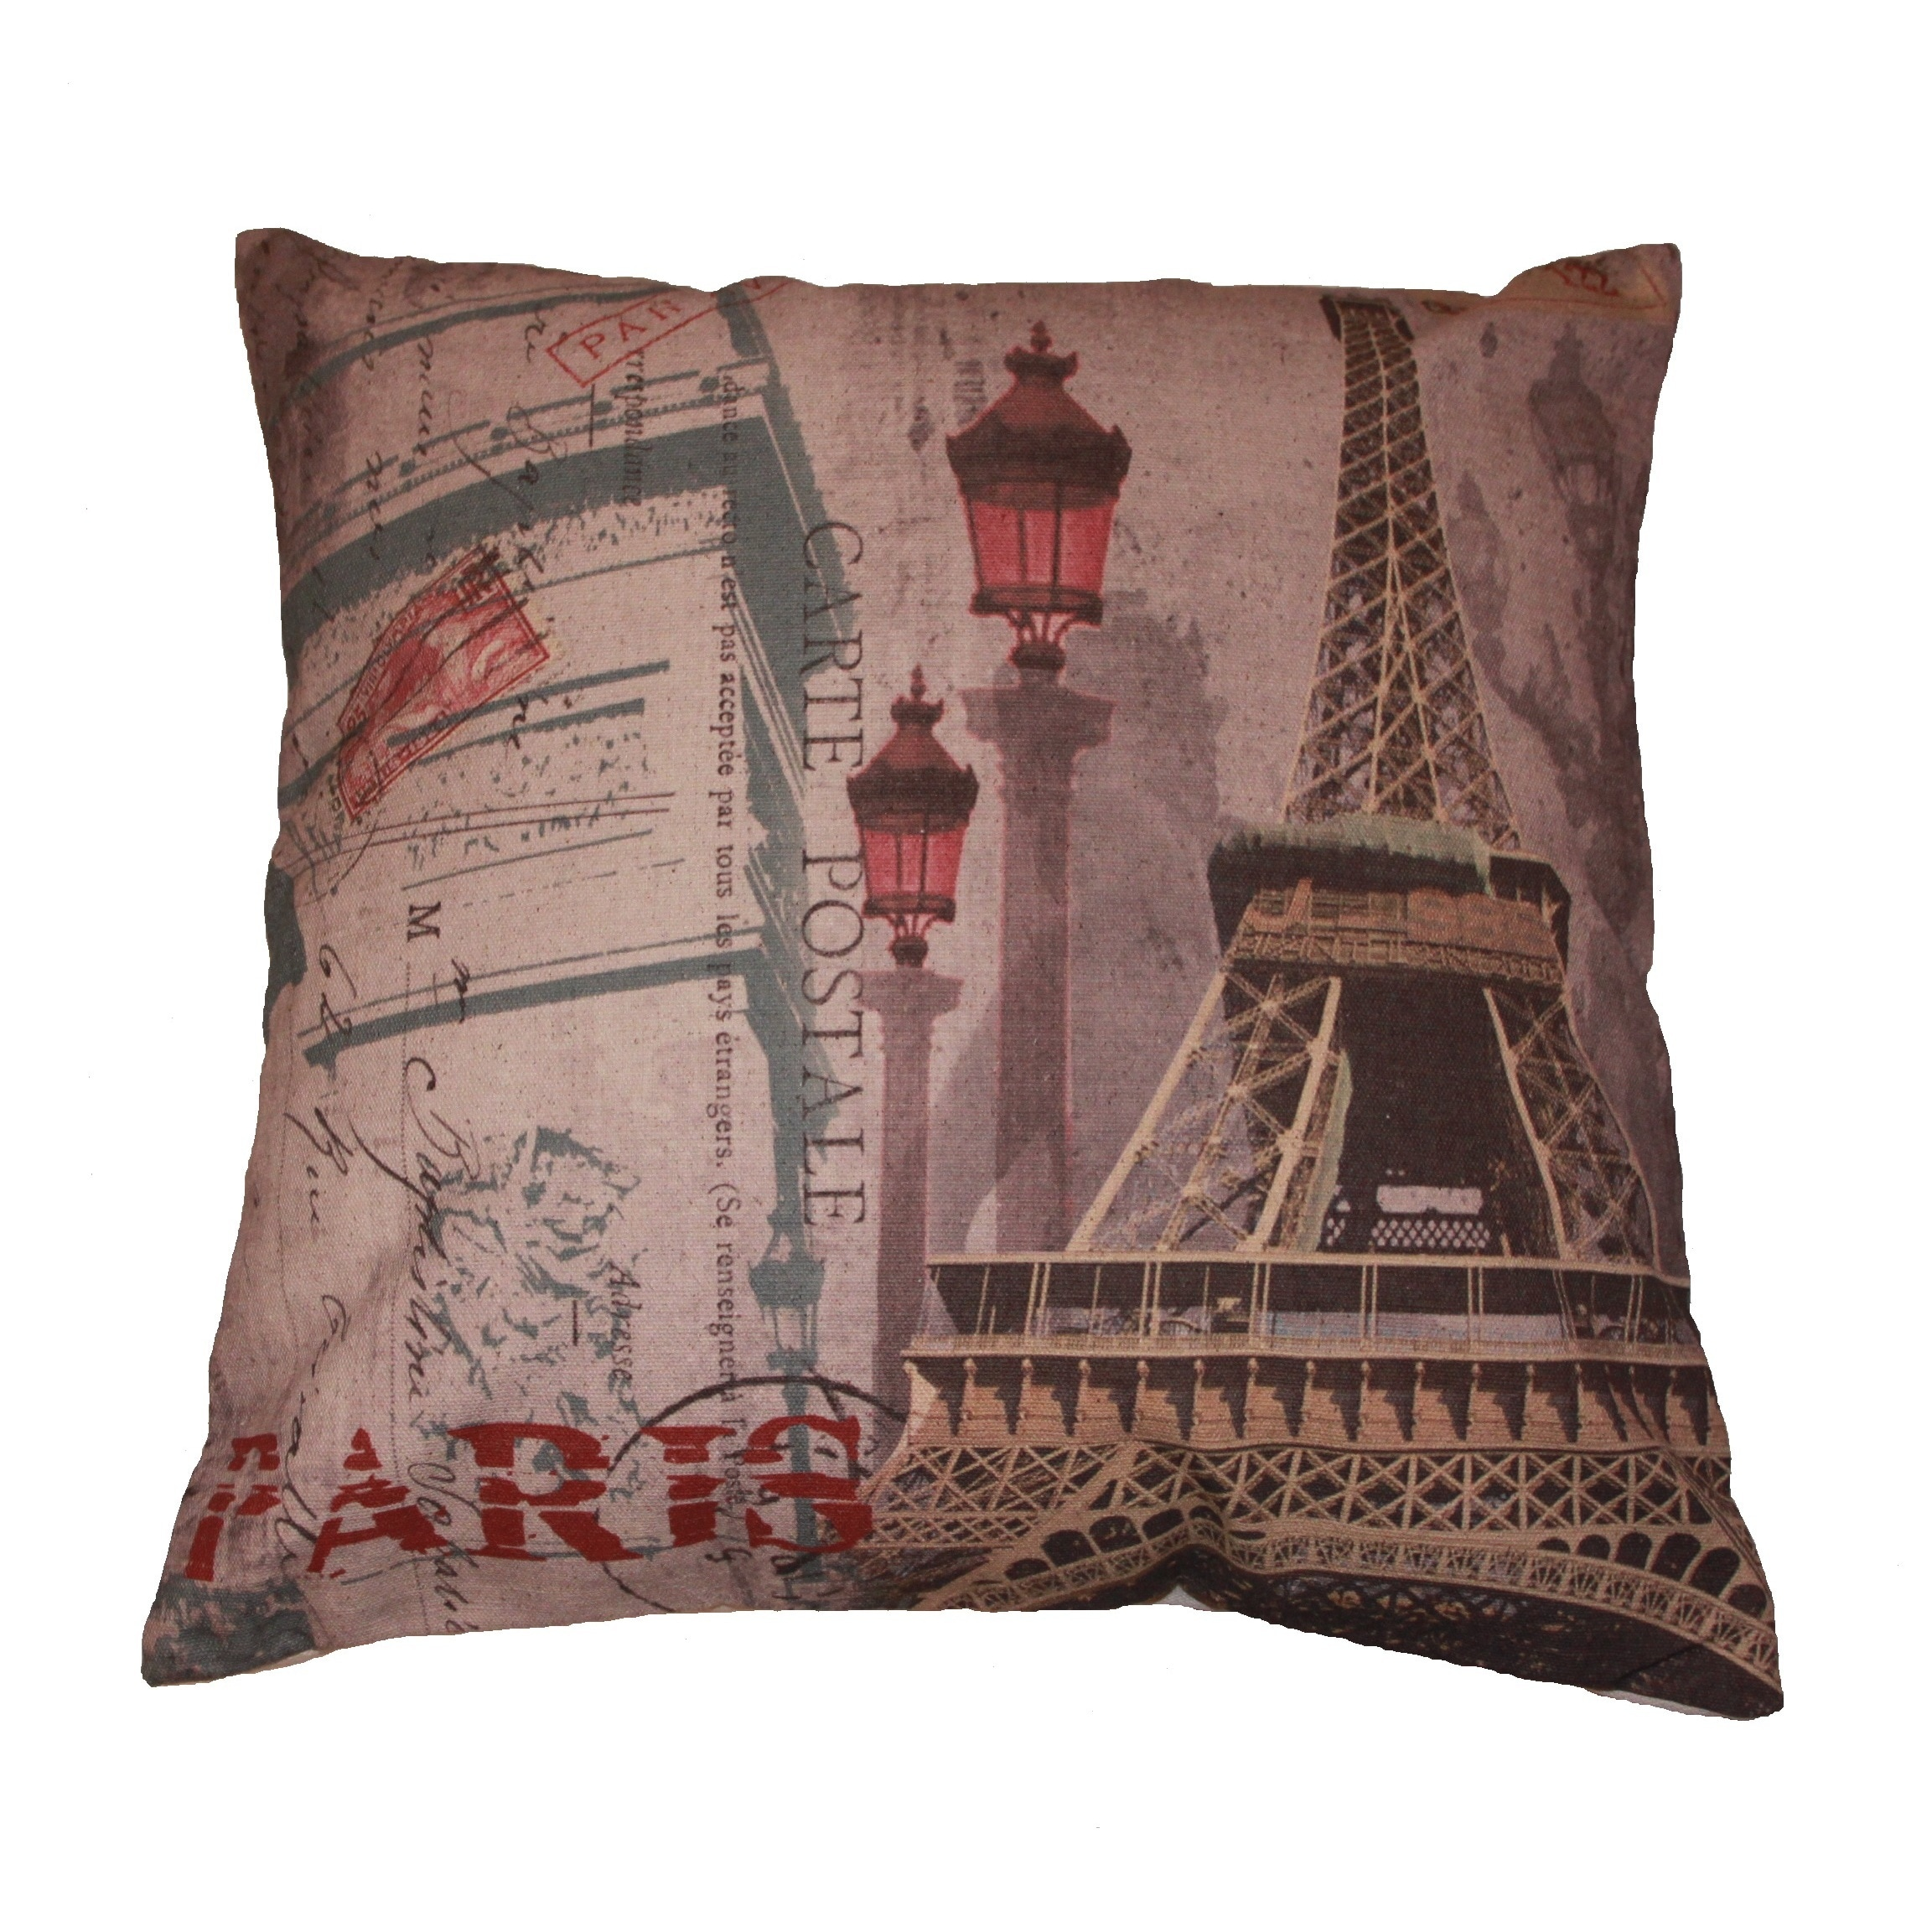 Decoration Carte Postale.Paris Carte Postale Decorative Throw Pillow